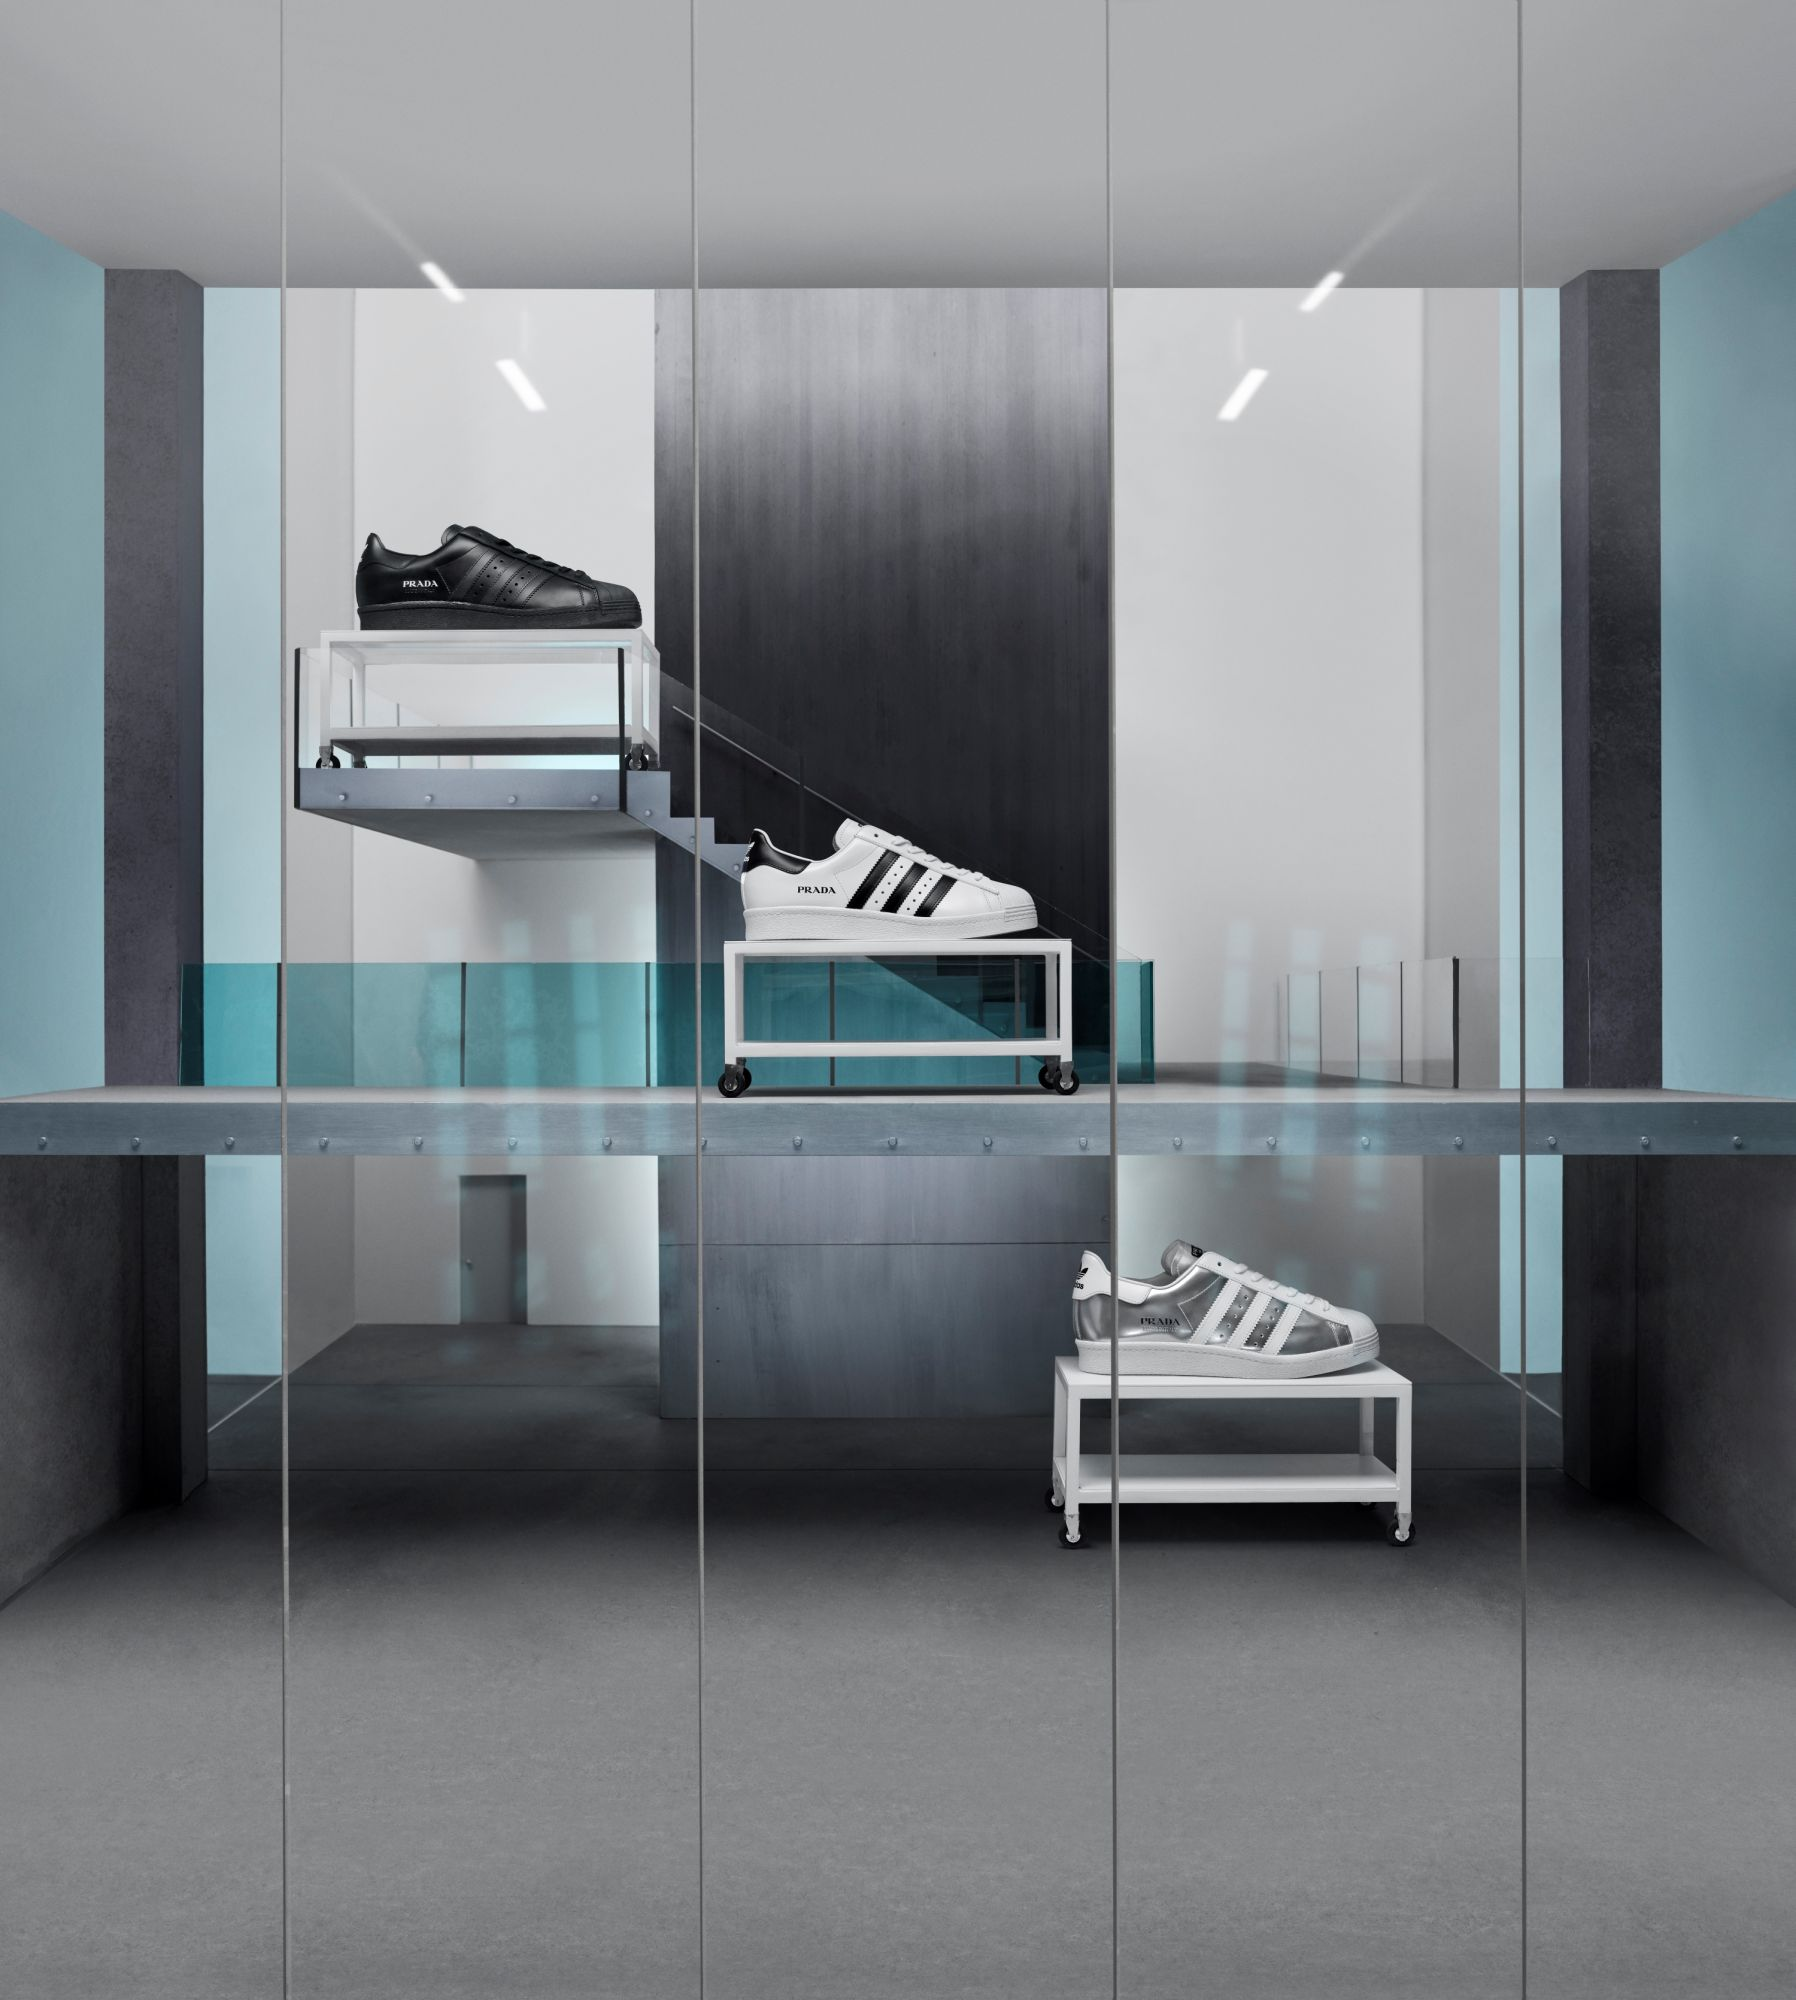 The Next Prada x Adidas Collaboration Will Drop Worldwide On September 8